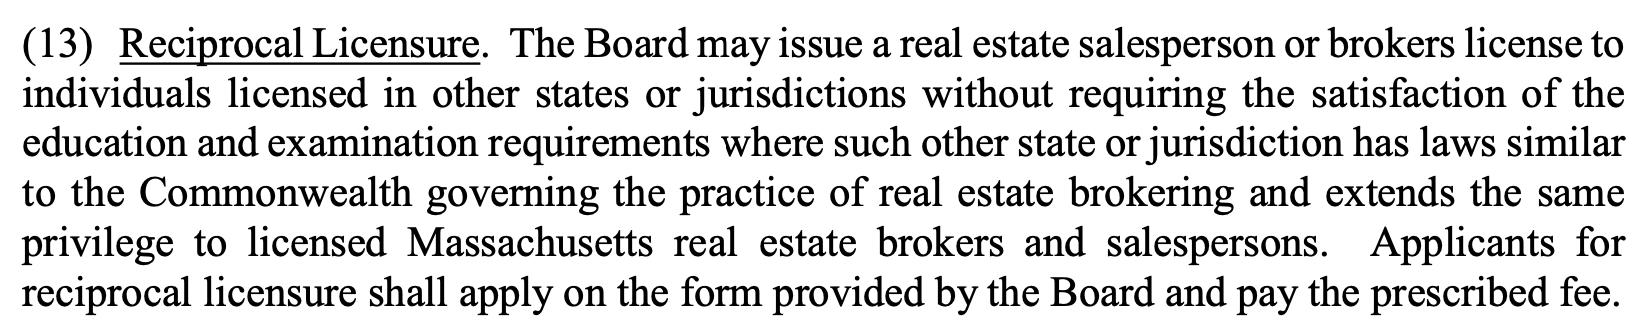 Massachusetts real estate legal advice